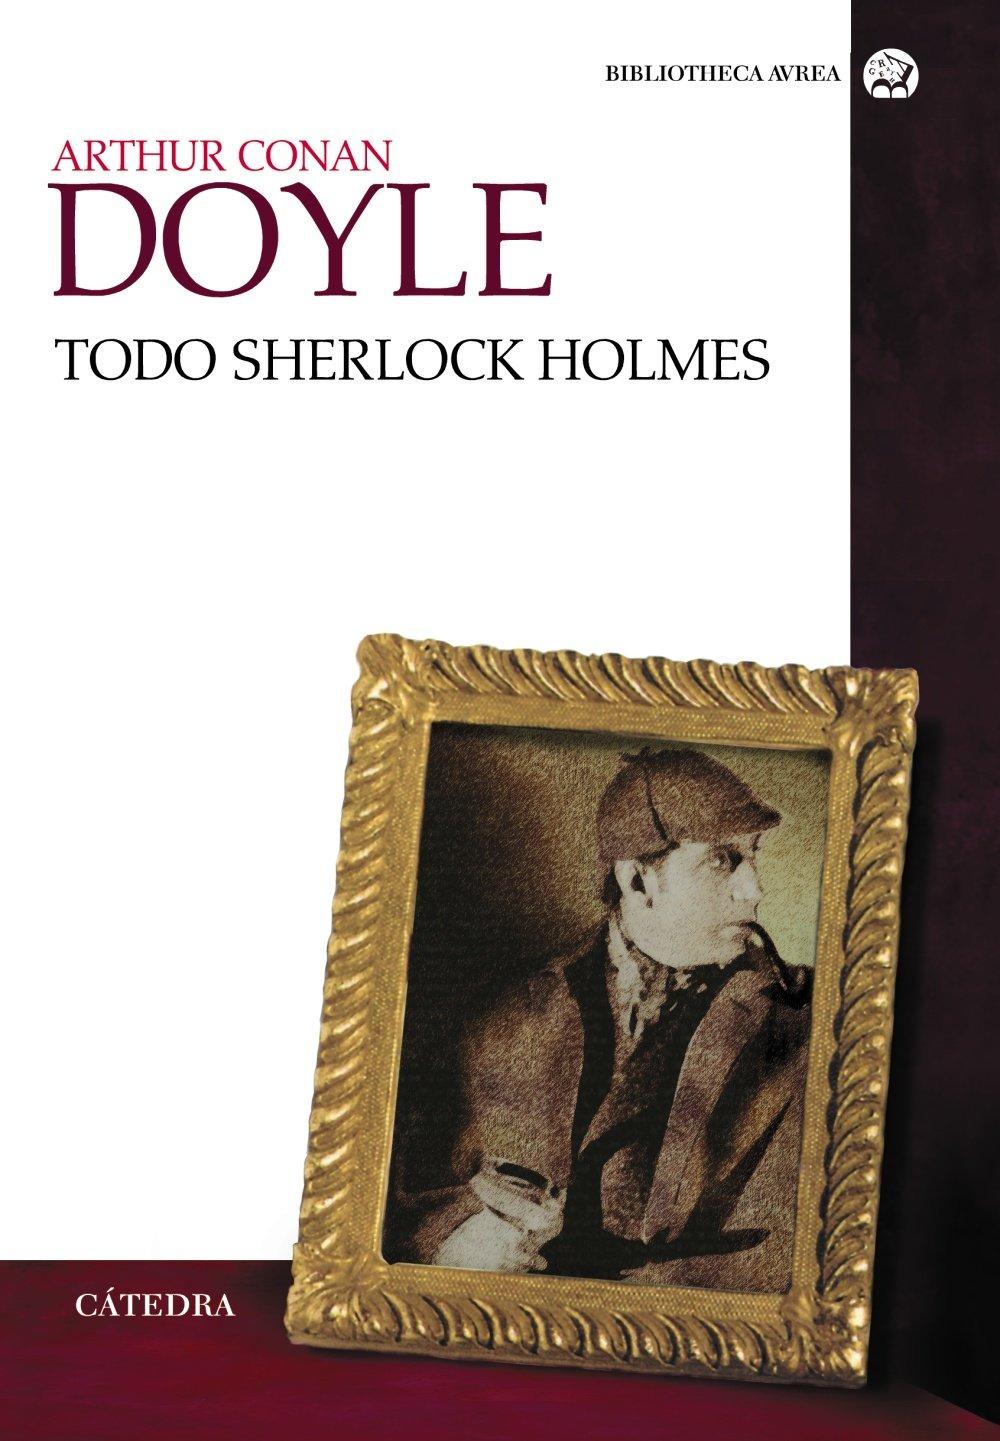 Todo Sherlock Holmes (Bibliotheca Avrea) Tapa blanda – 14 feb 2012 Arthur Conan Doyle Cátedra 8437629918 Spanish: Adult Fiction